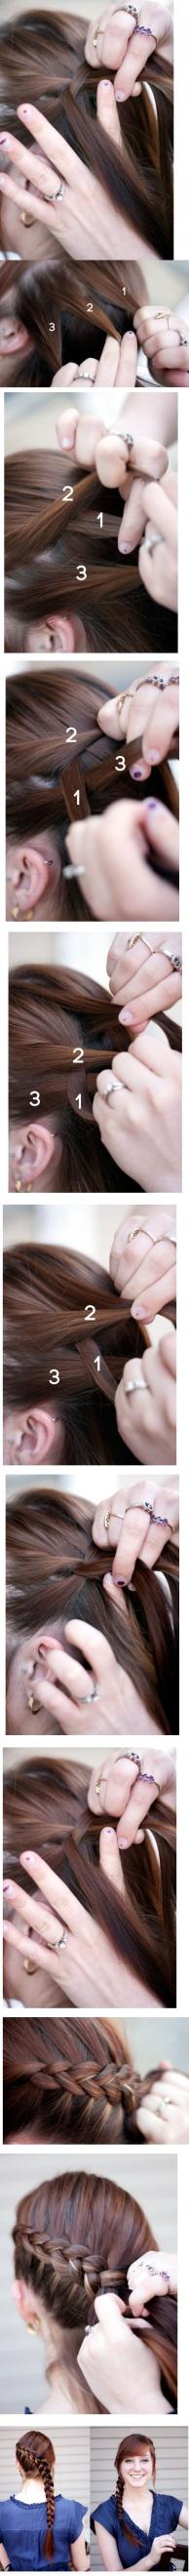 peinado trenza tutorial